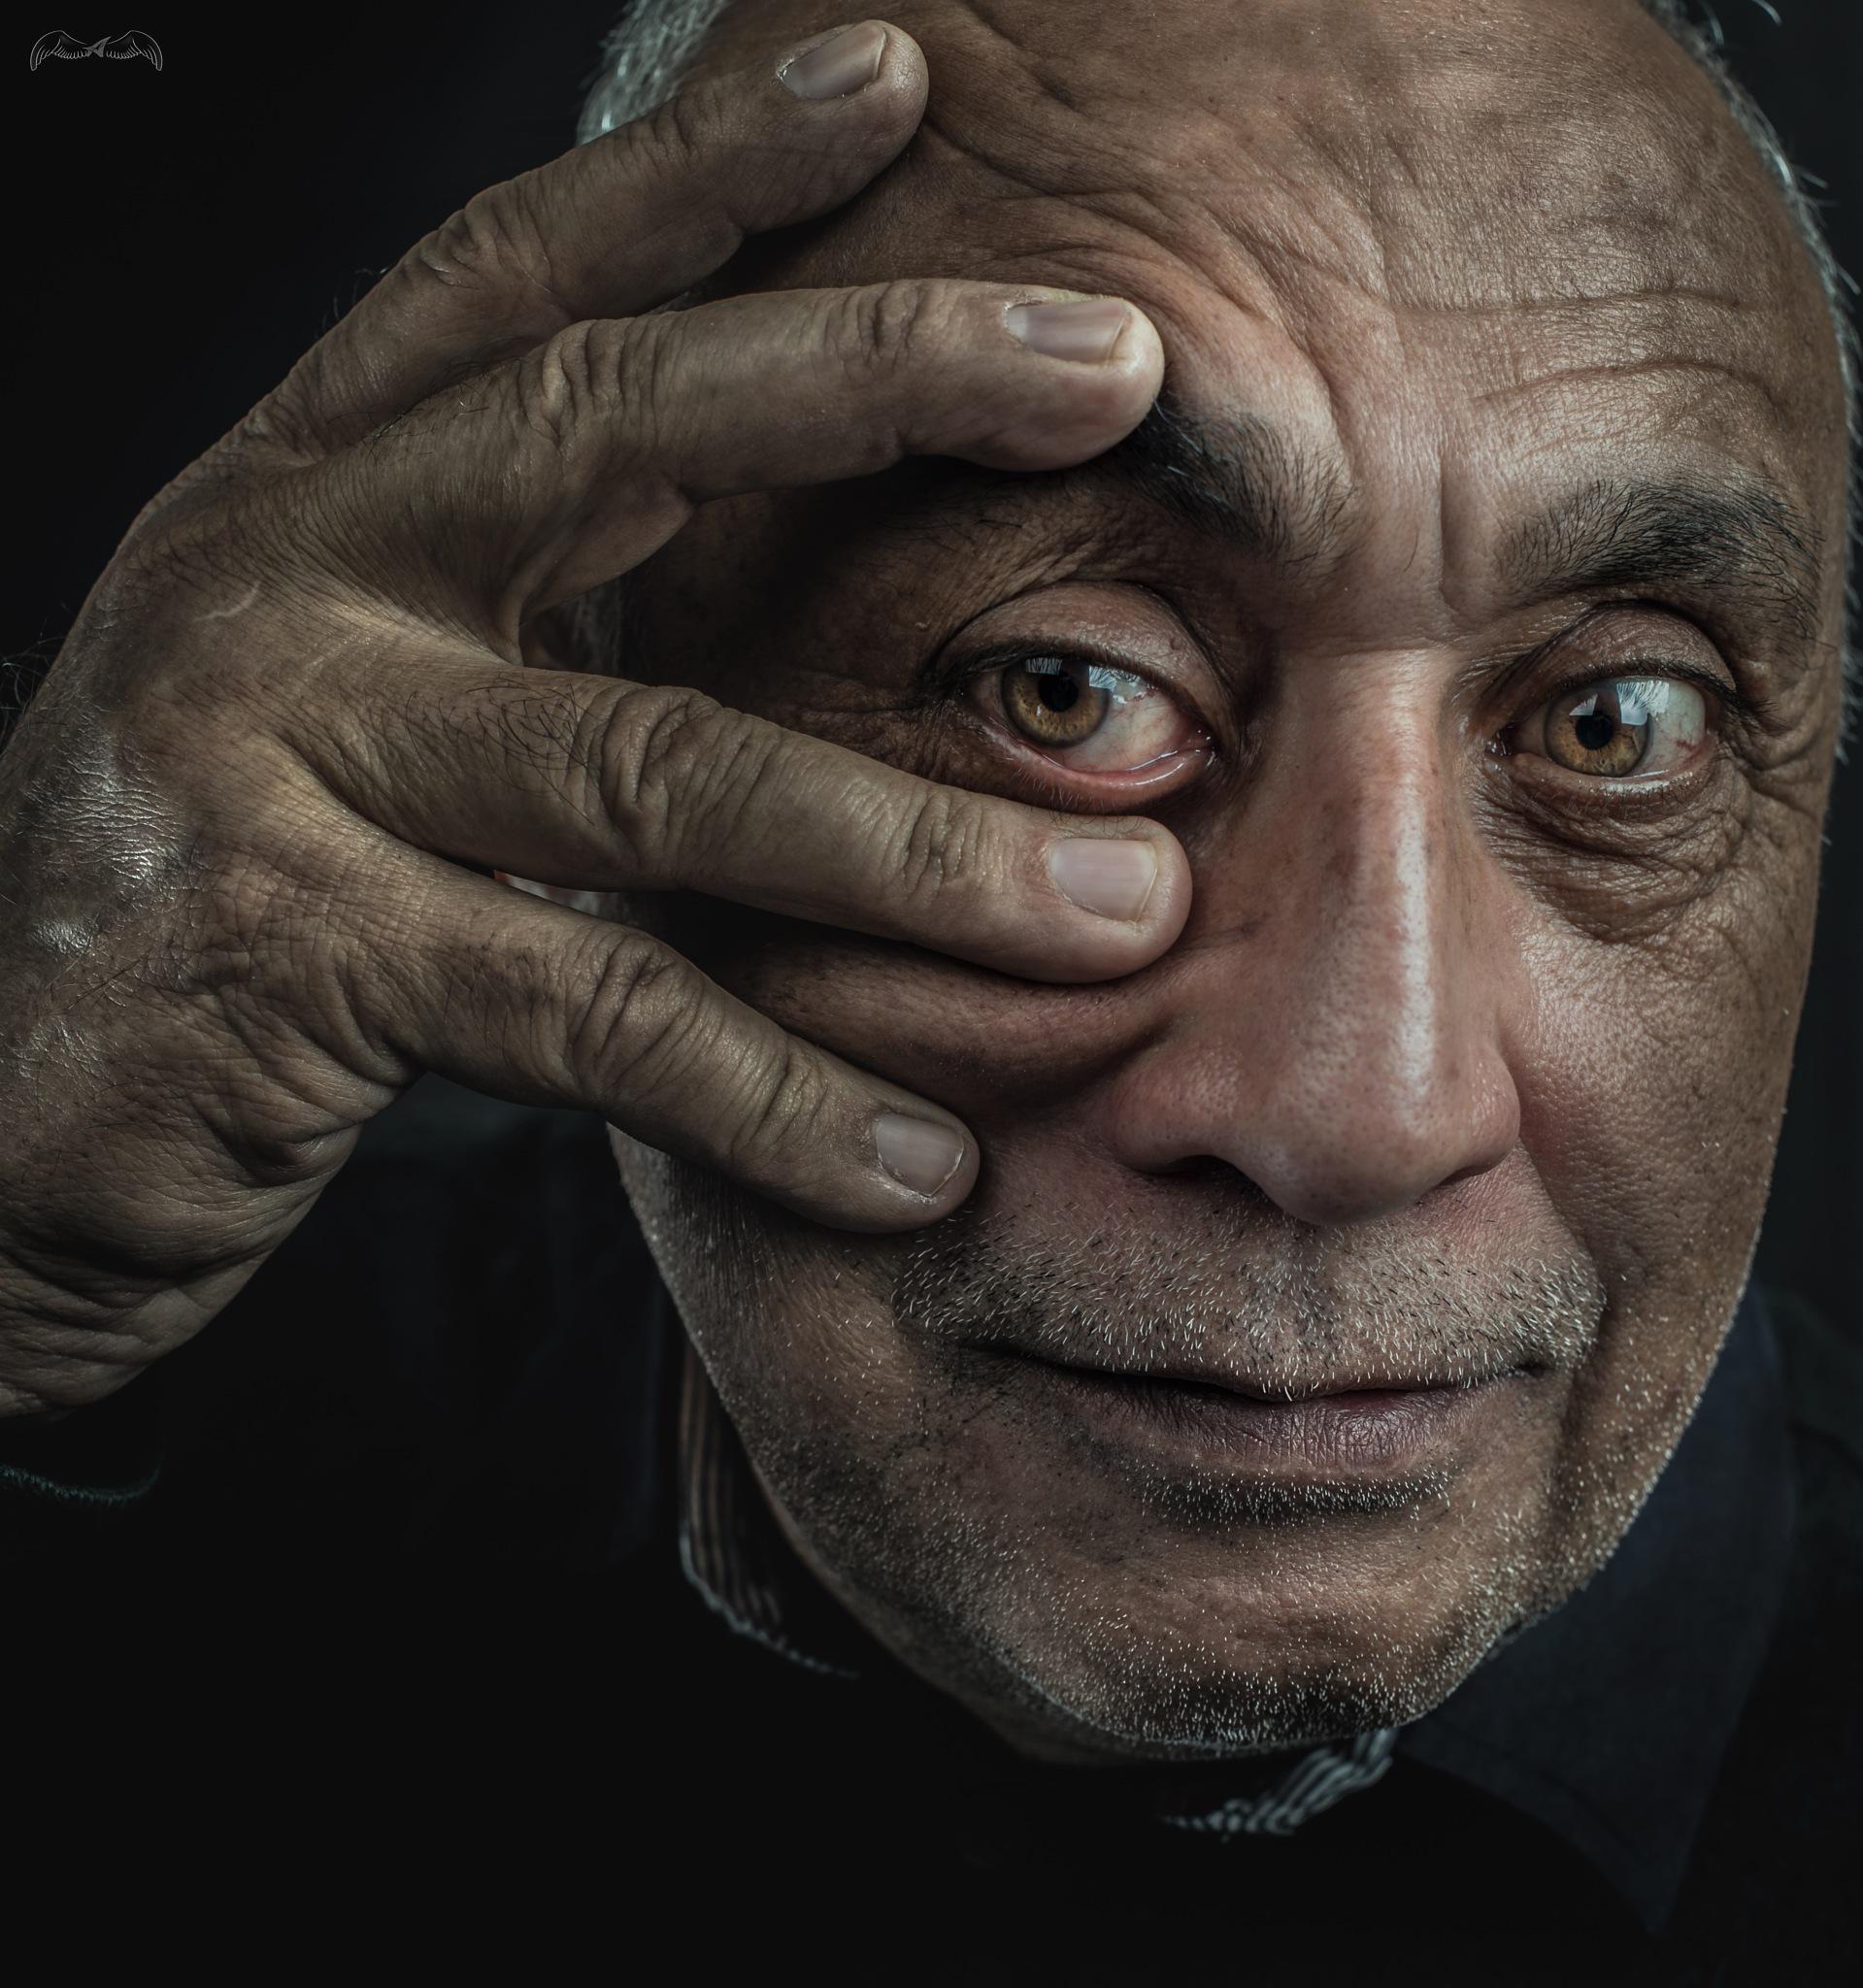 Look inside my eye... by Ahmed AL-karadi